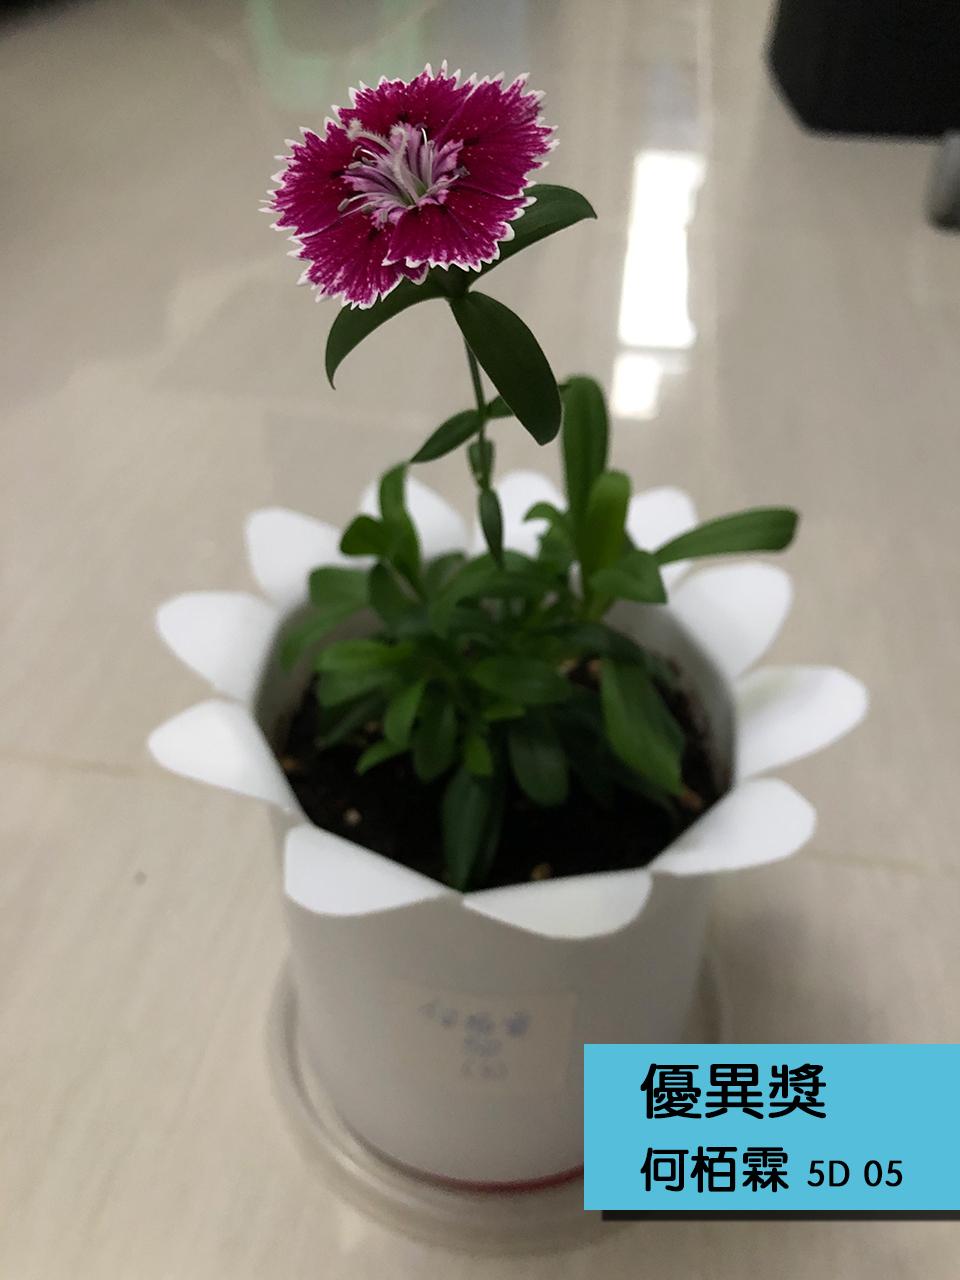 https://plkcjy.edu.hk/sites/default/files/you_yi_jiang_5d_05_he_bo_lin_.jpg